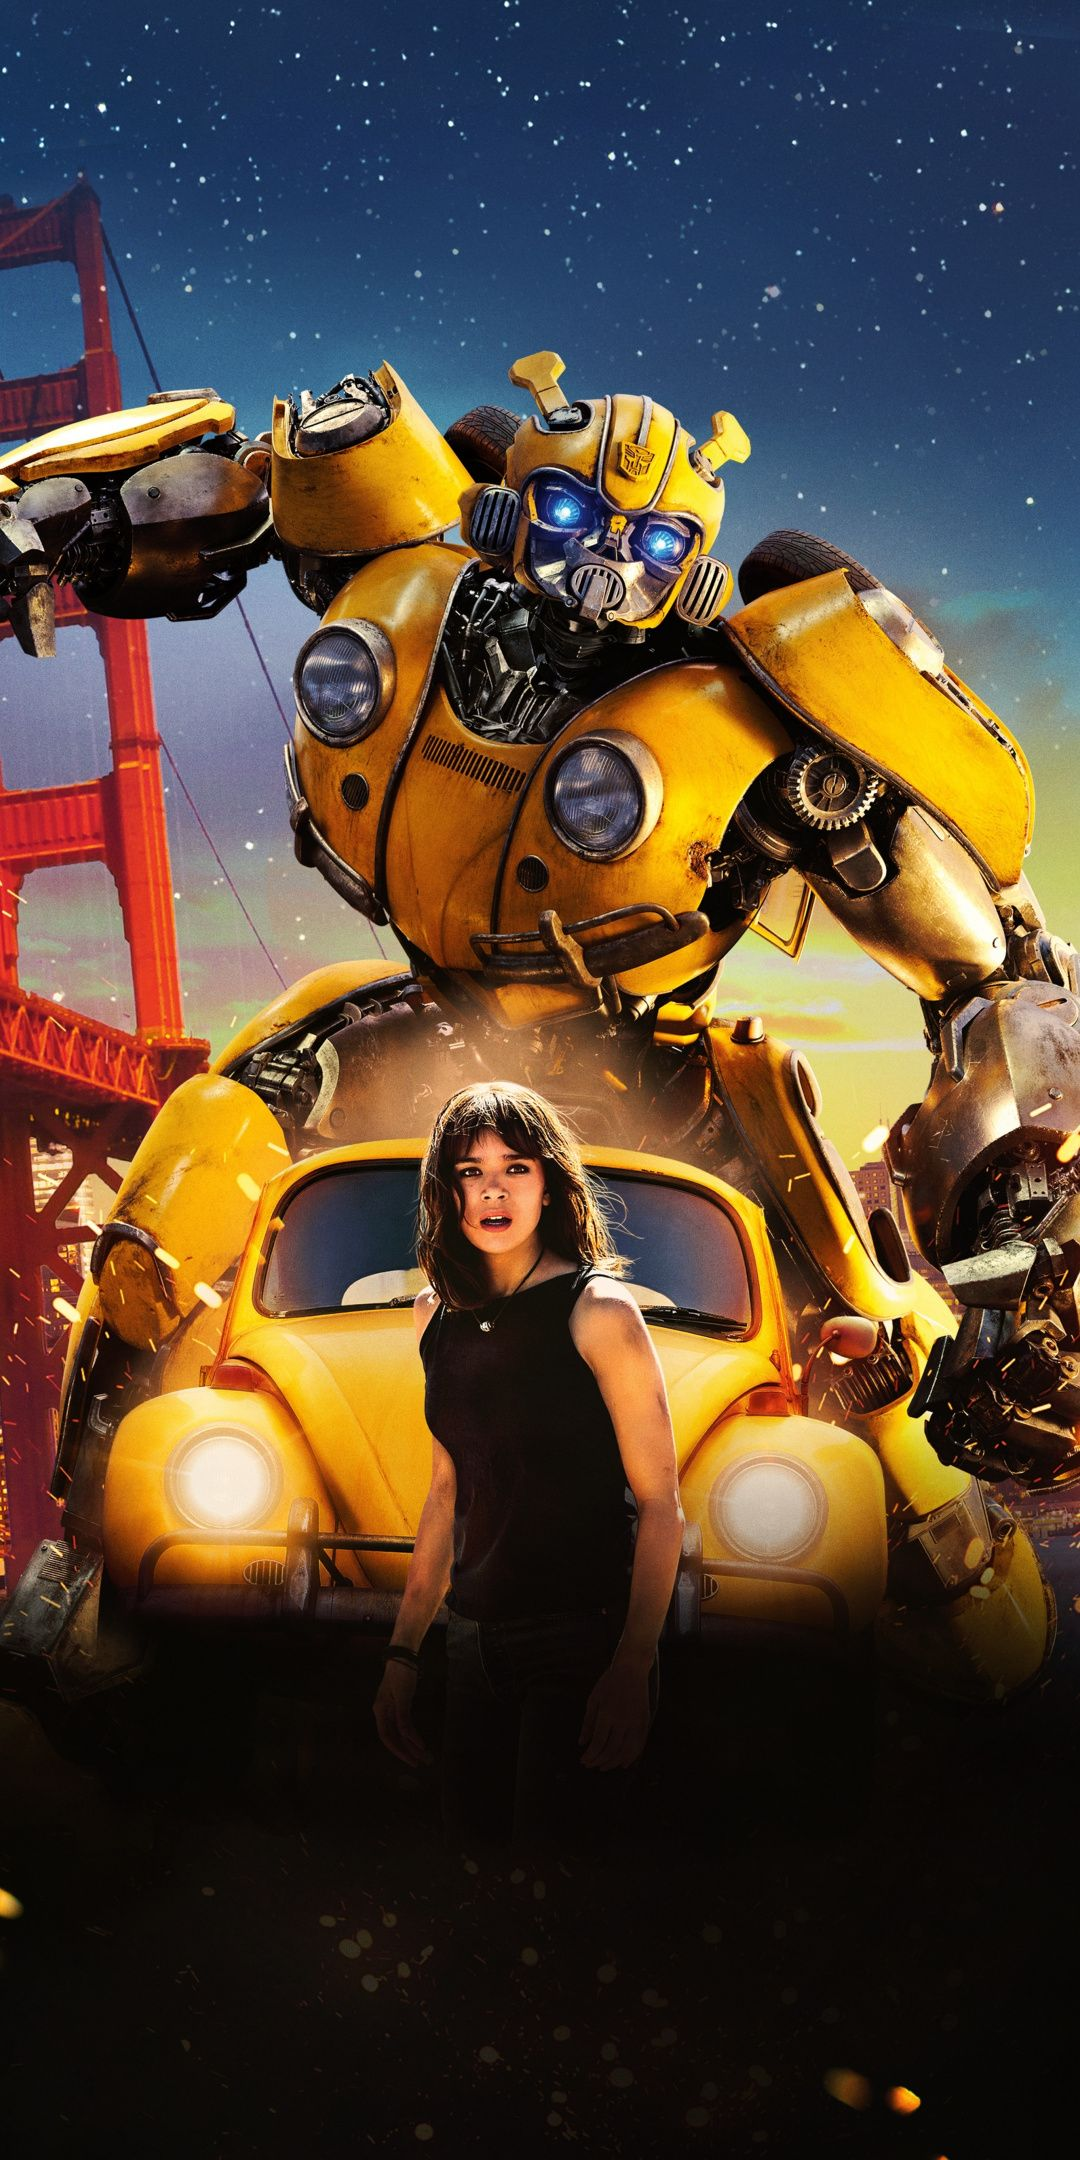 Movie Bumblebee Transformers Hailee Steinfeld X Wallpaper